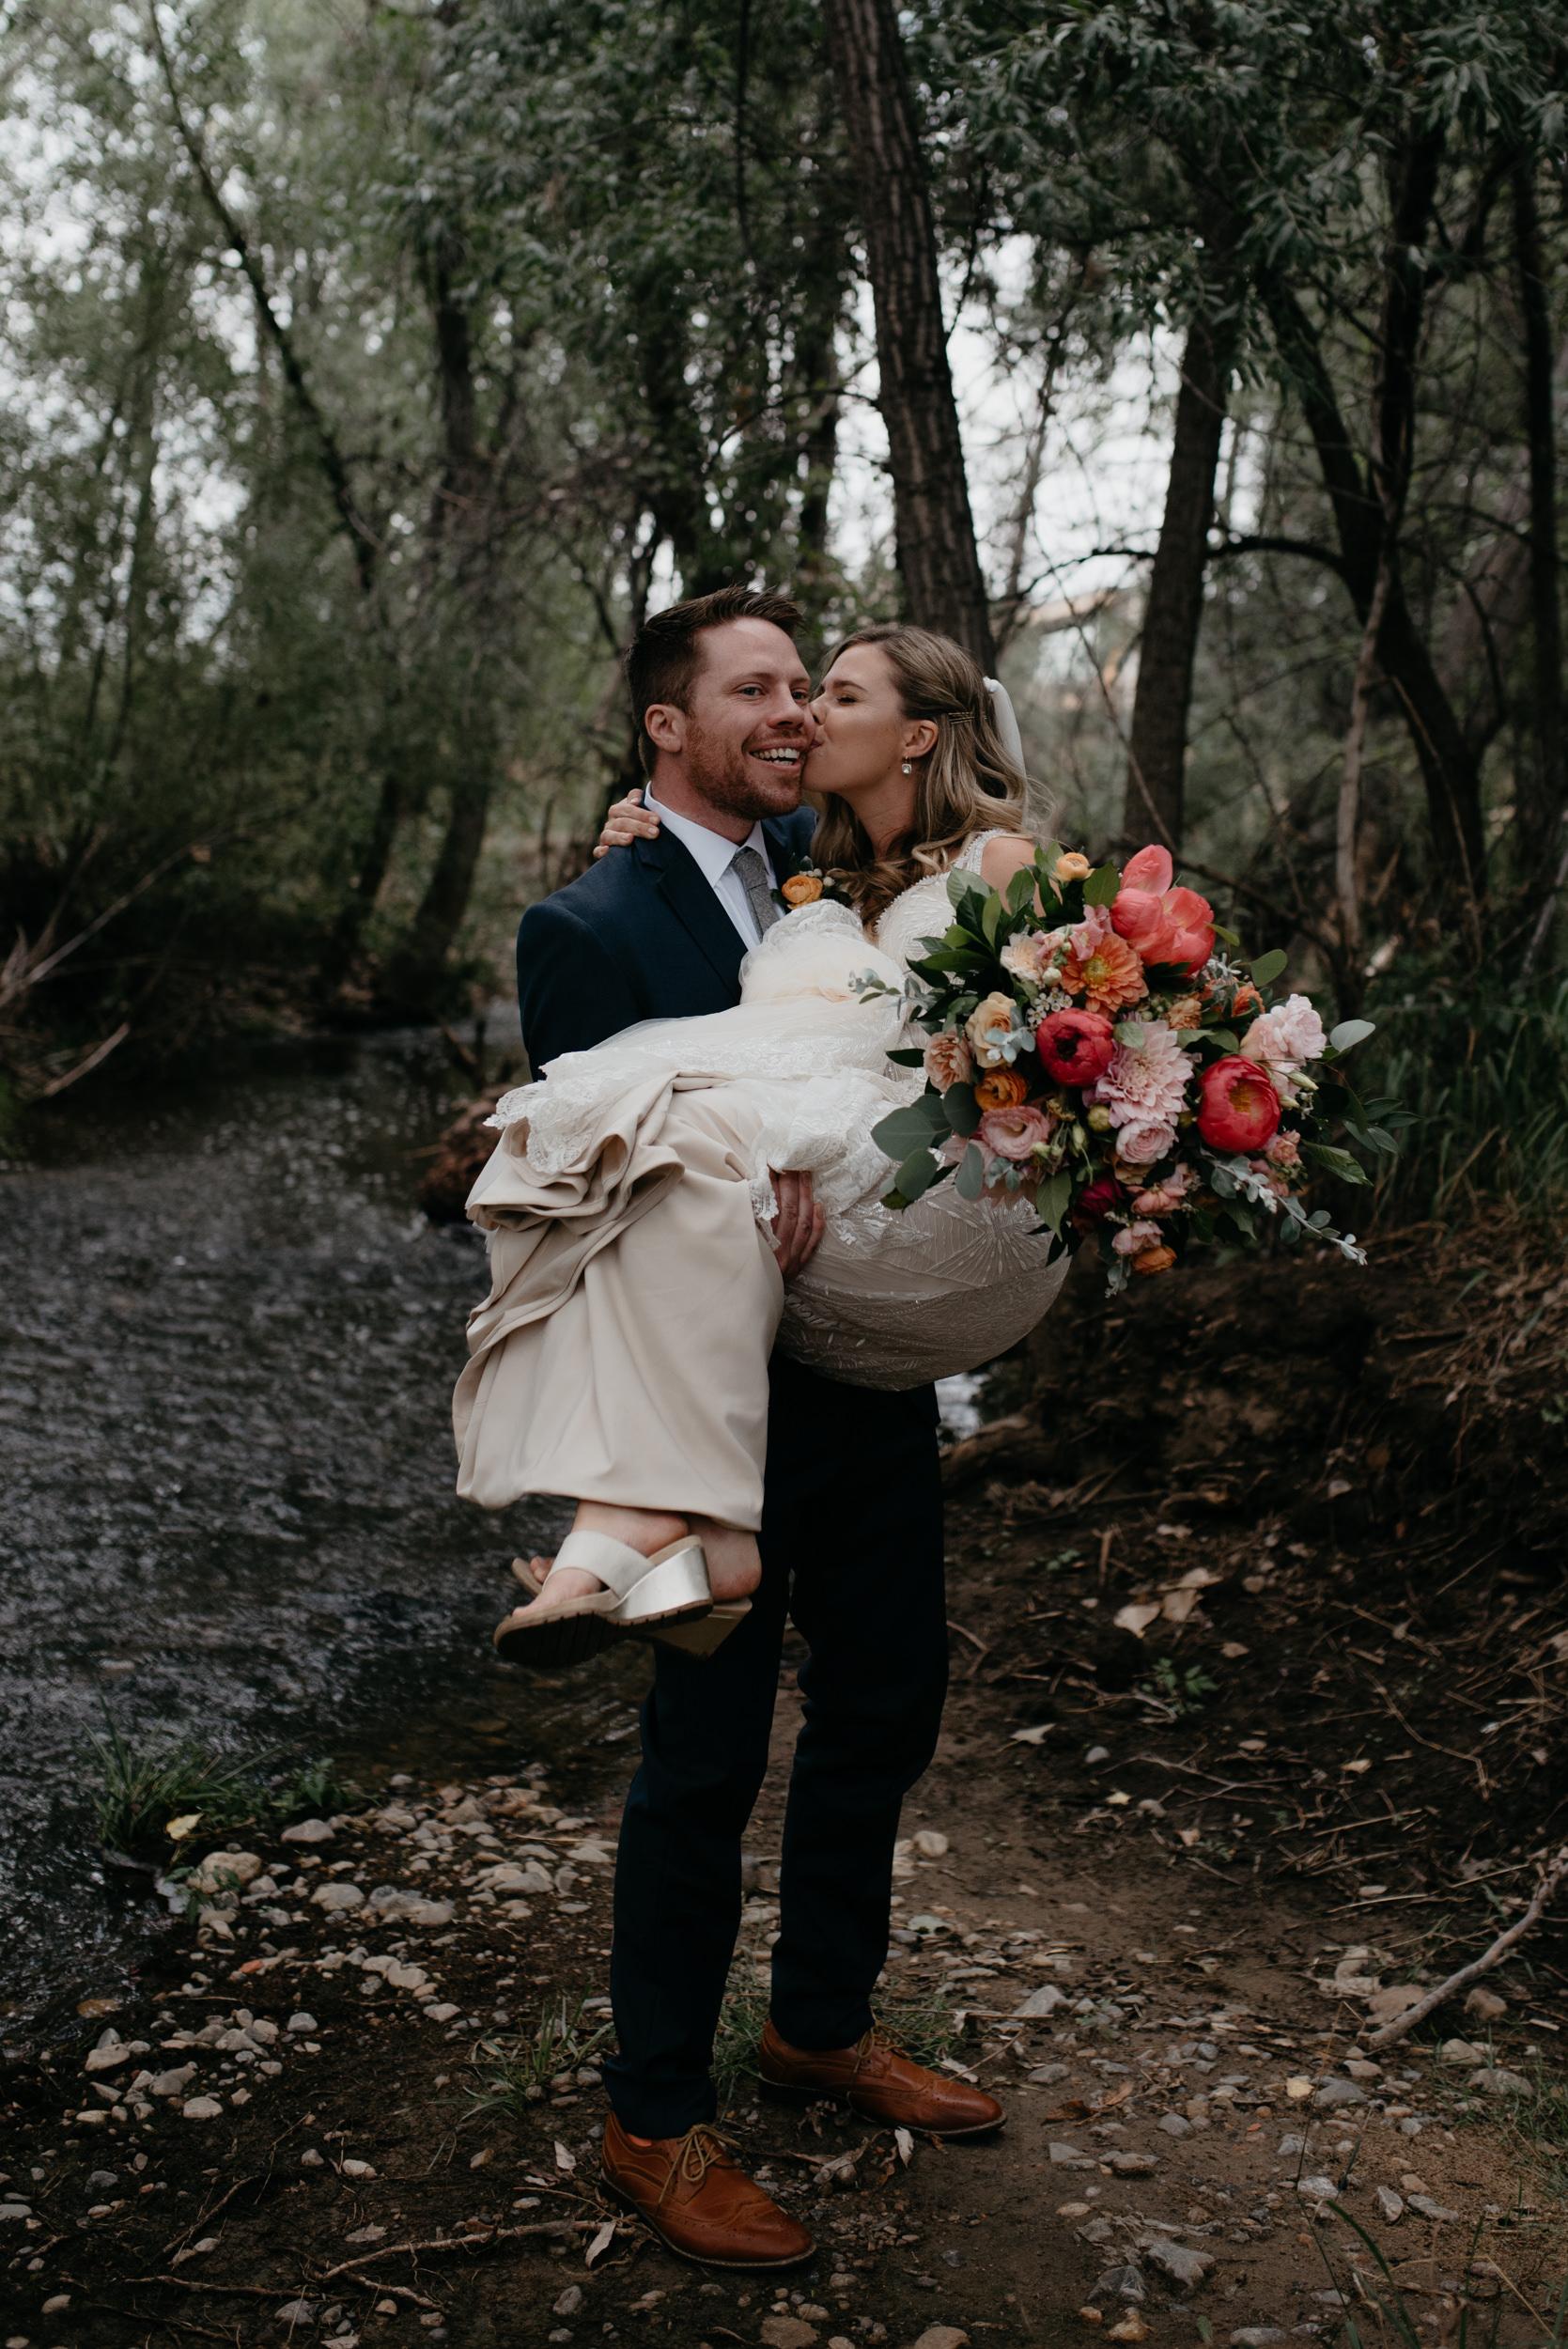 Boulder wedding and elopement photographer. Colorado adventure wedding photographer.